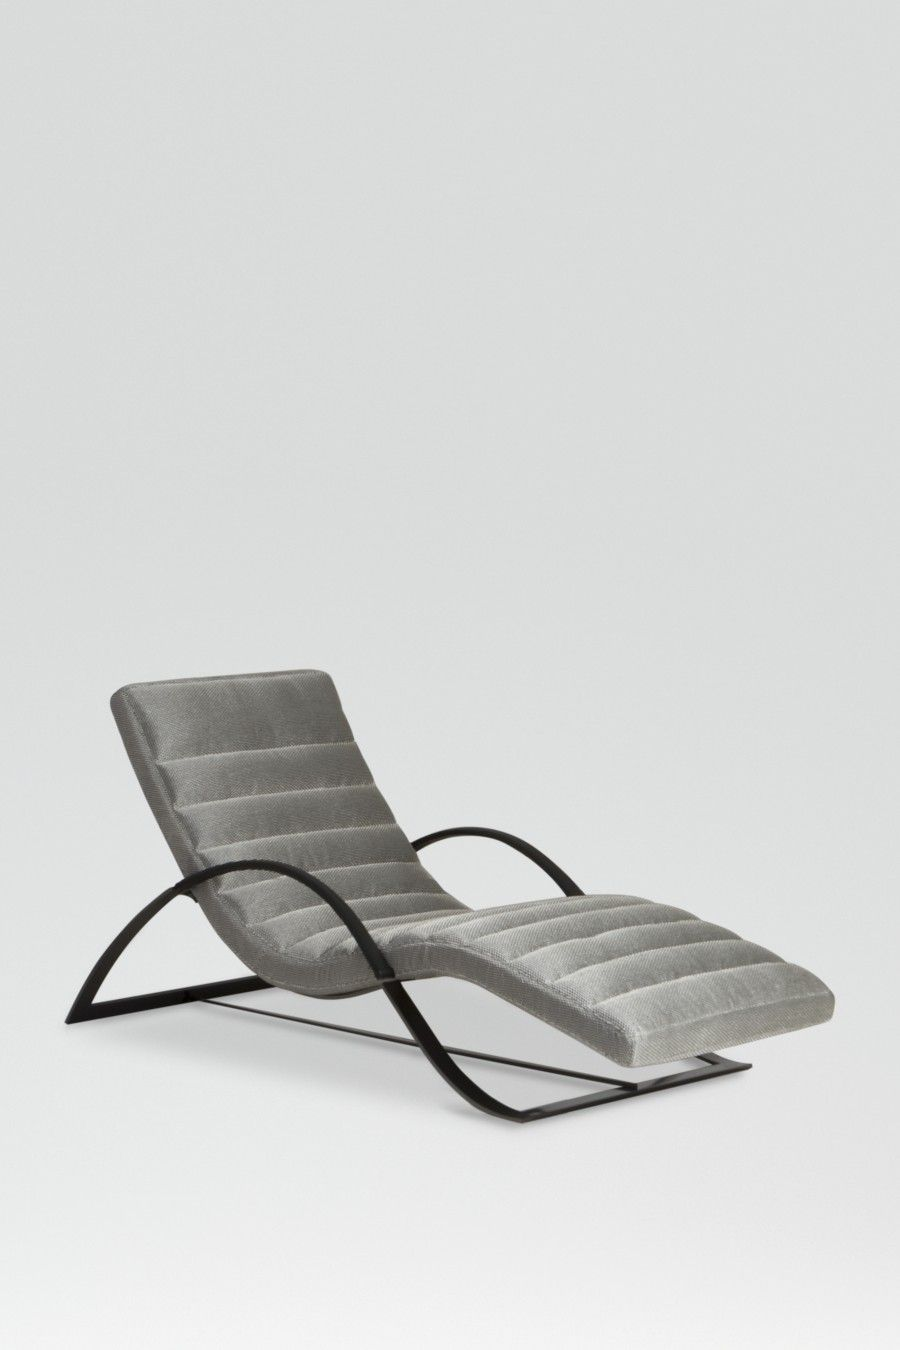 Bernini Armani Casa Terrace Furniture Interior Design Chair Sleek Furniture Design